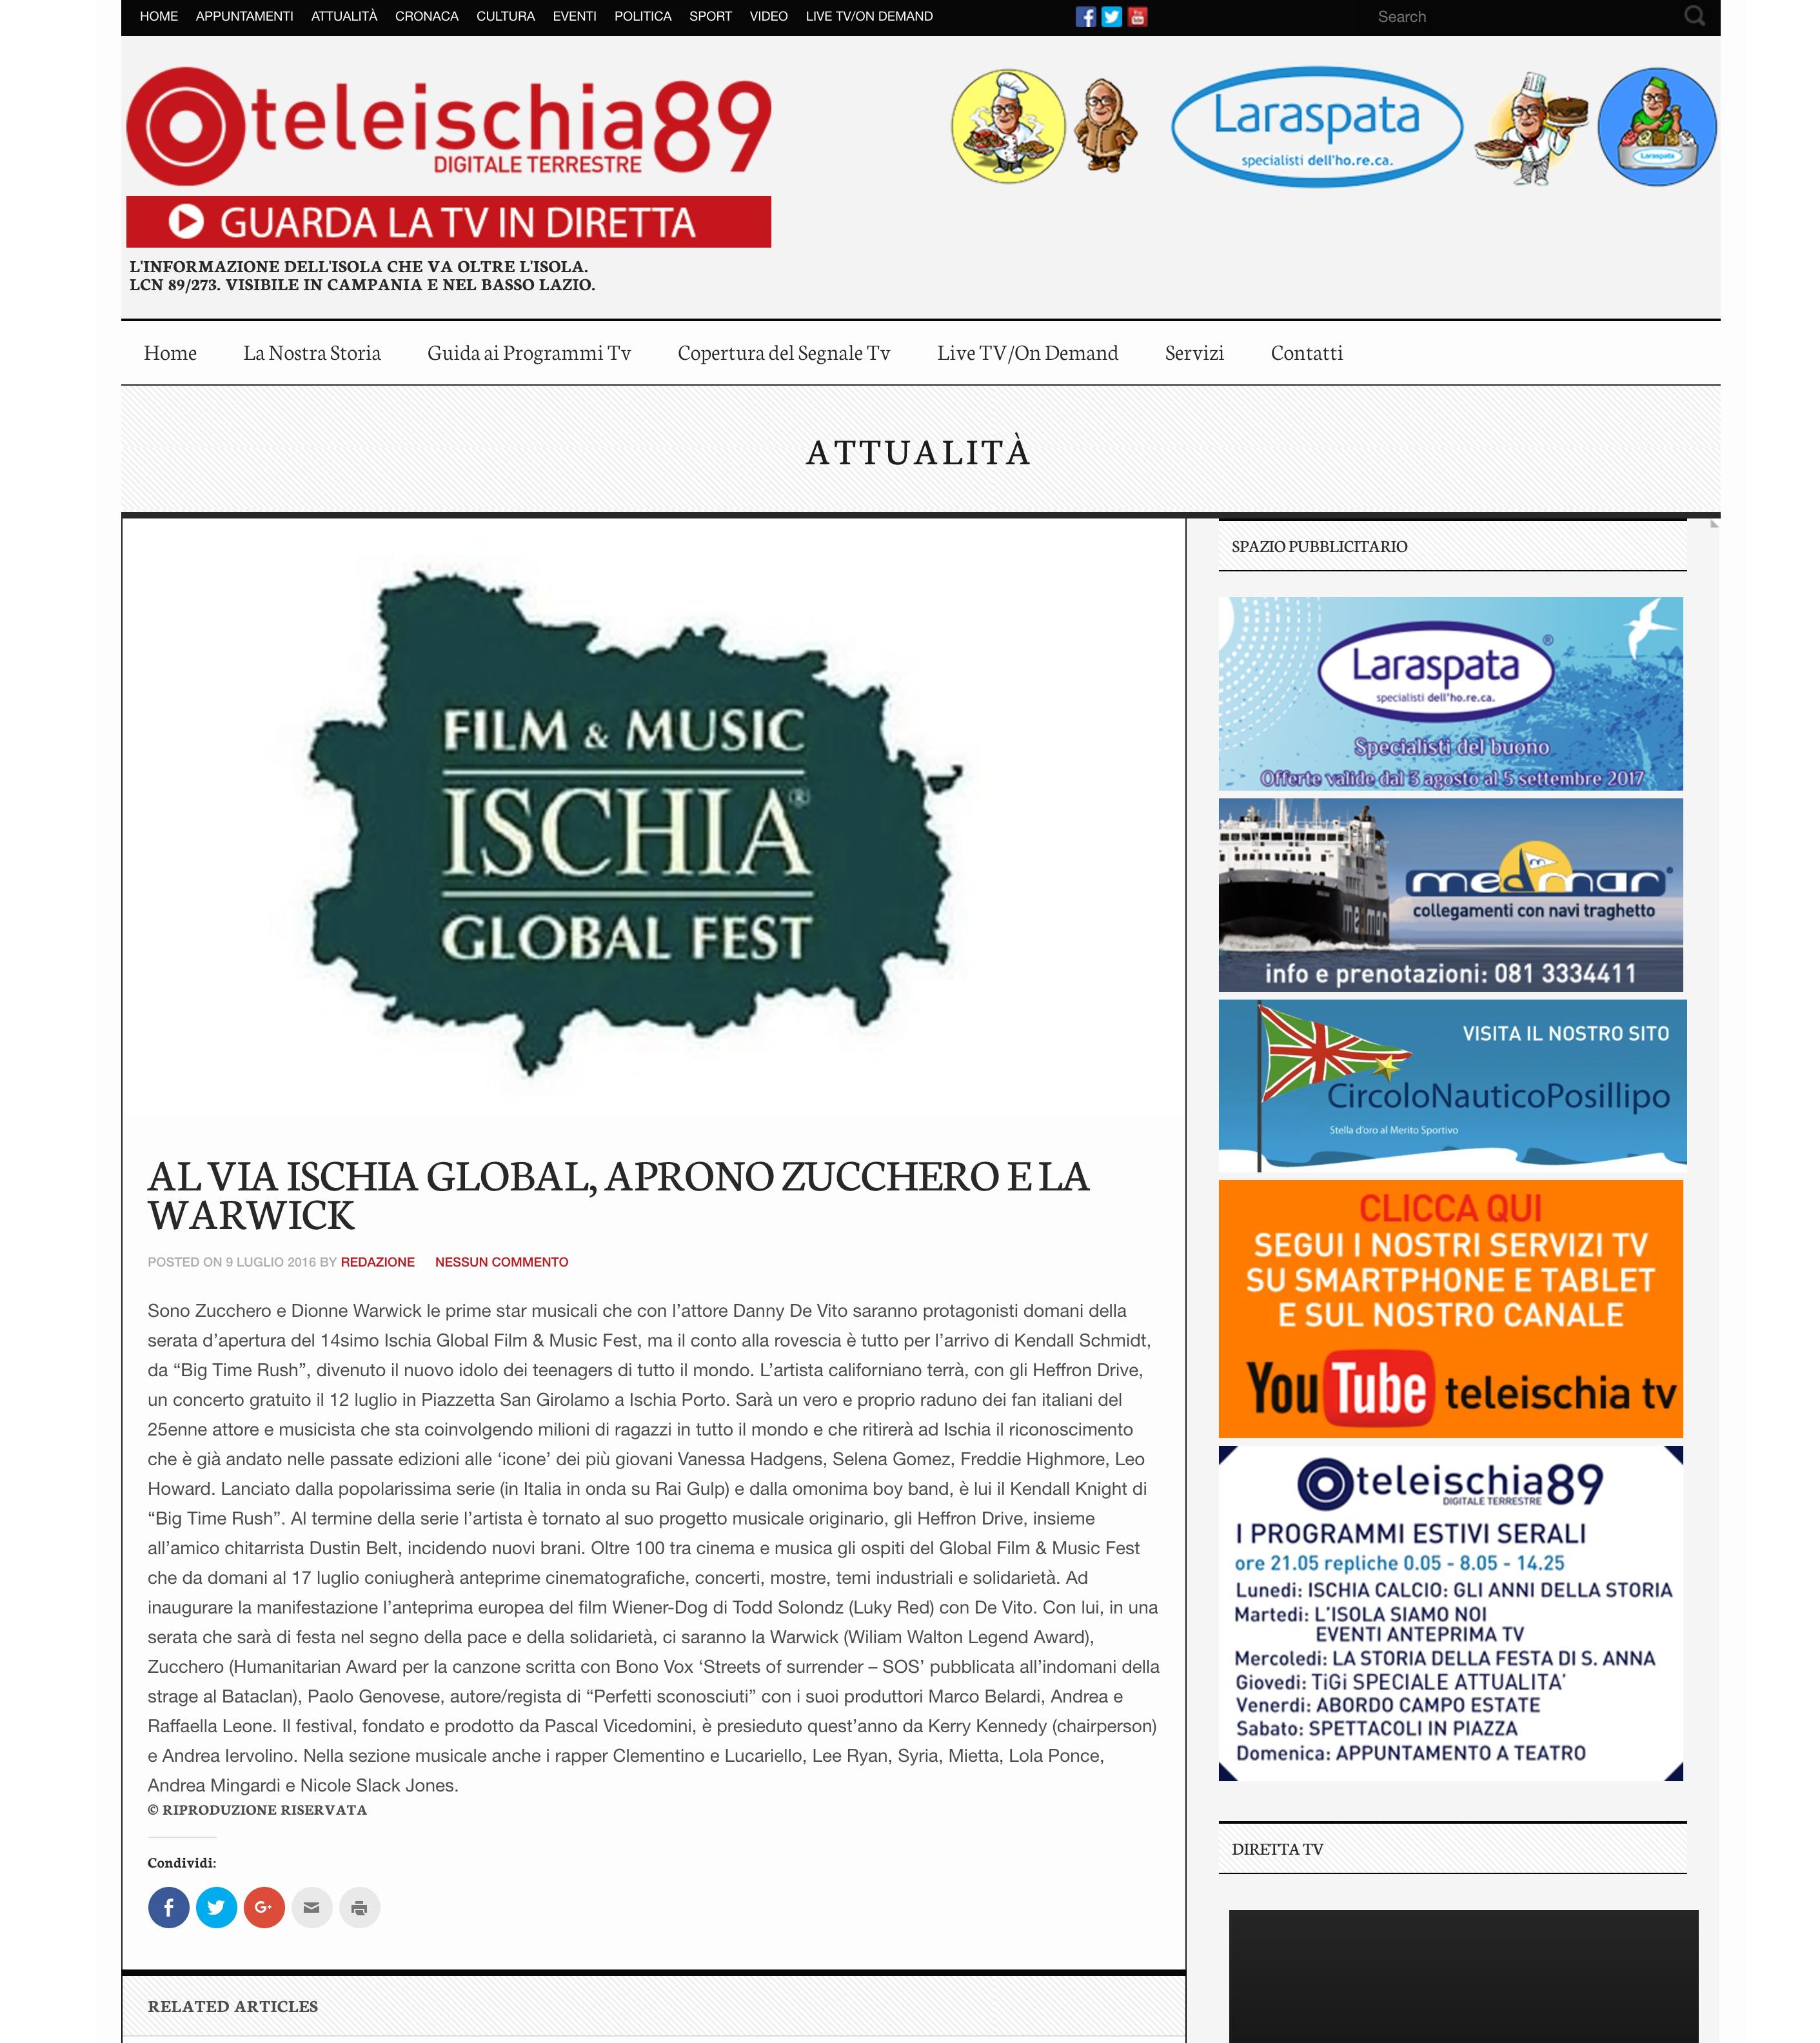 TELE ISCHIA - ISCHIA GLOBAL FEST